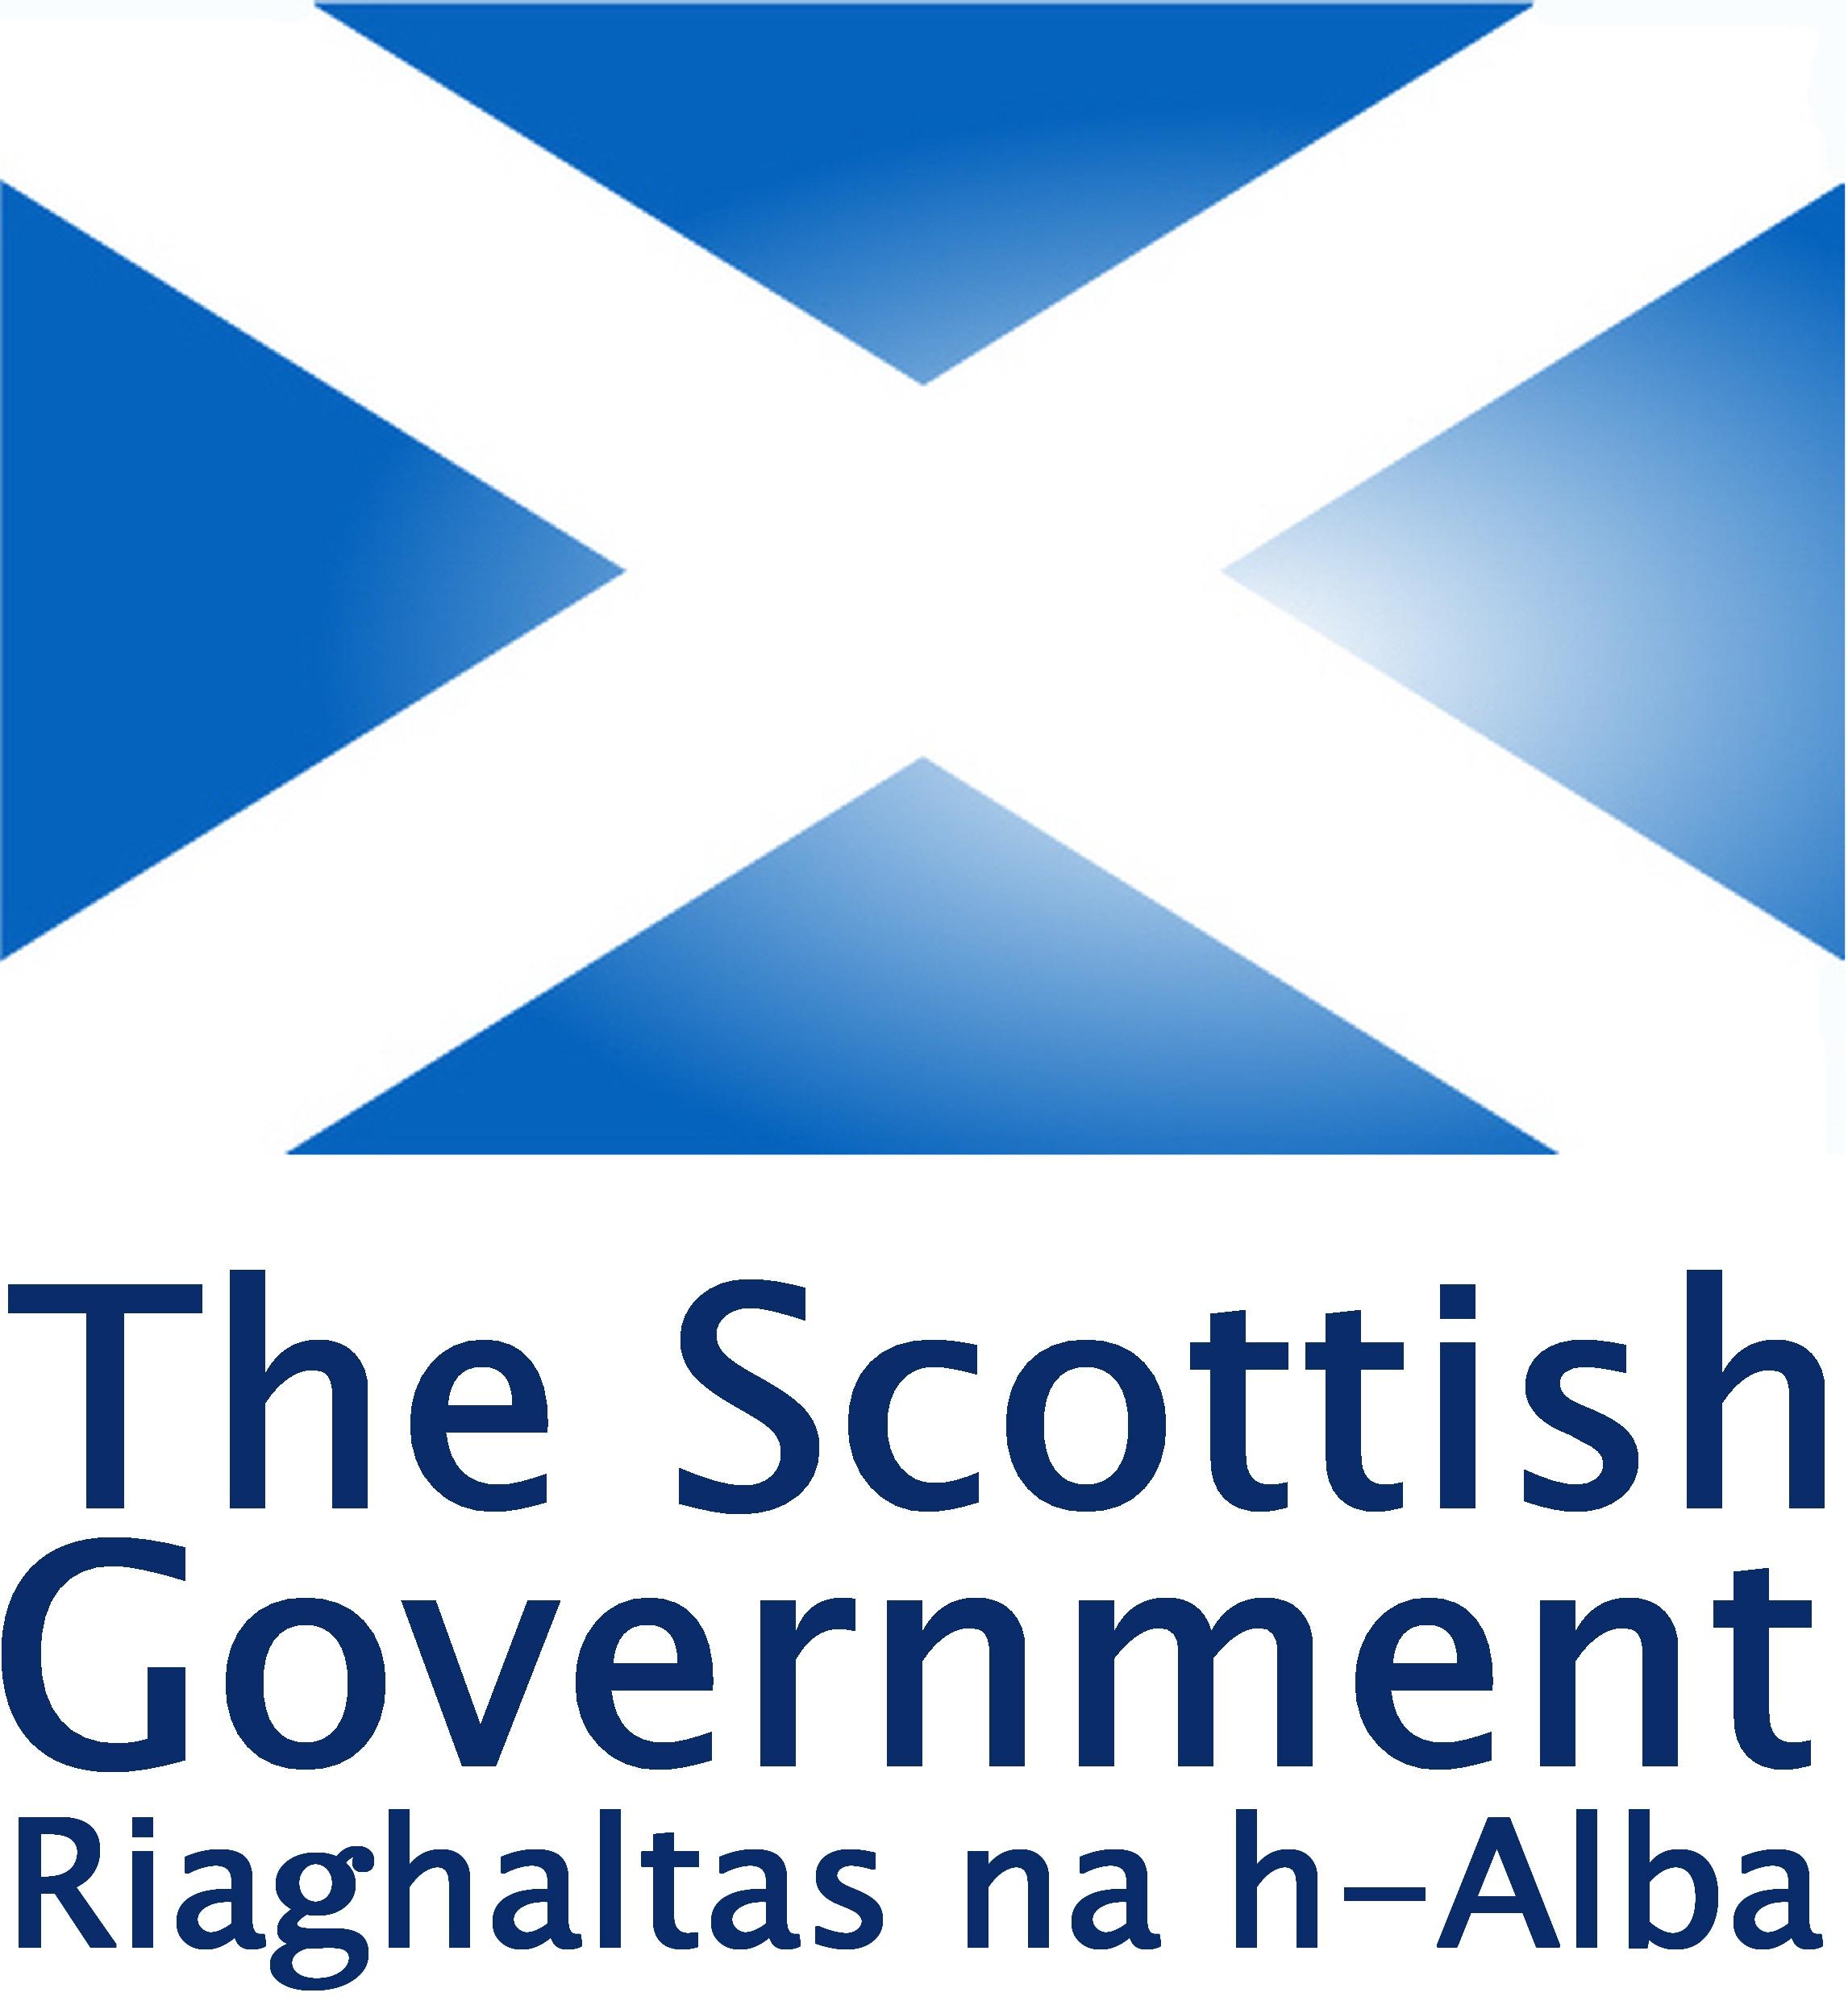 Scottish-government-logo-1.jpg